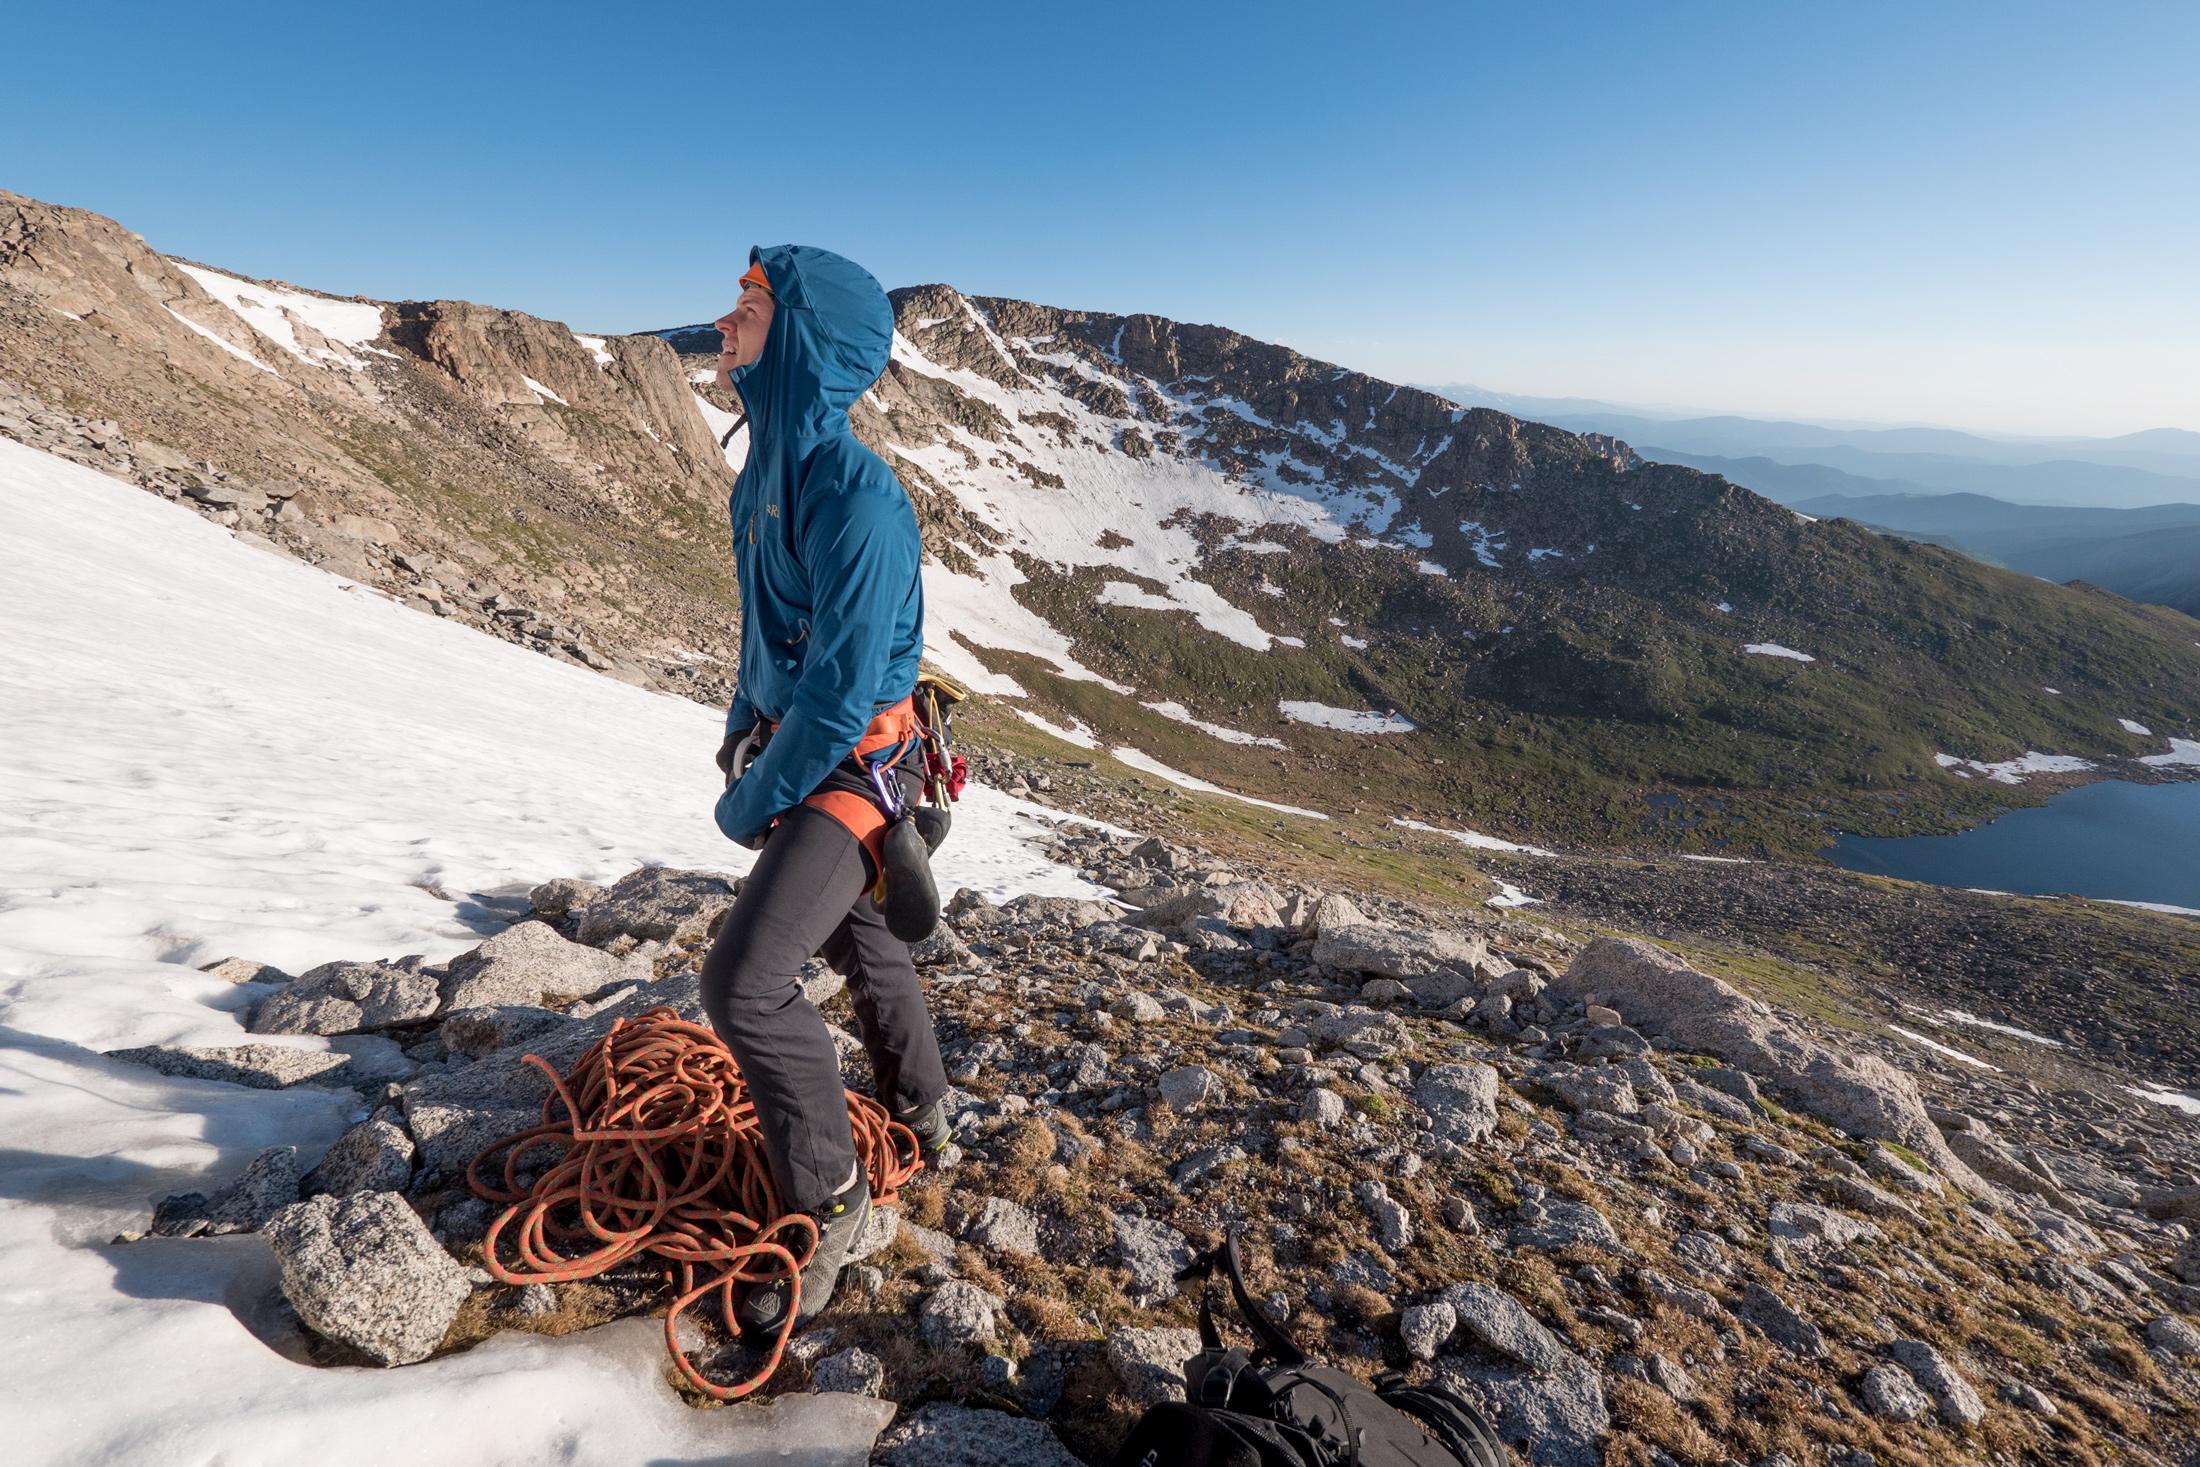 colorado-climbing-2017-1030445-web.jpg